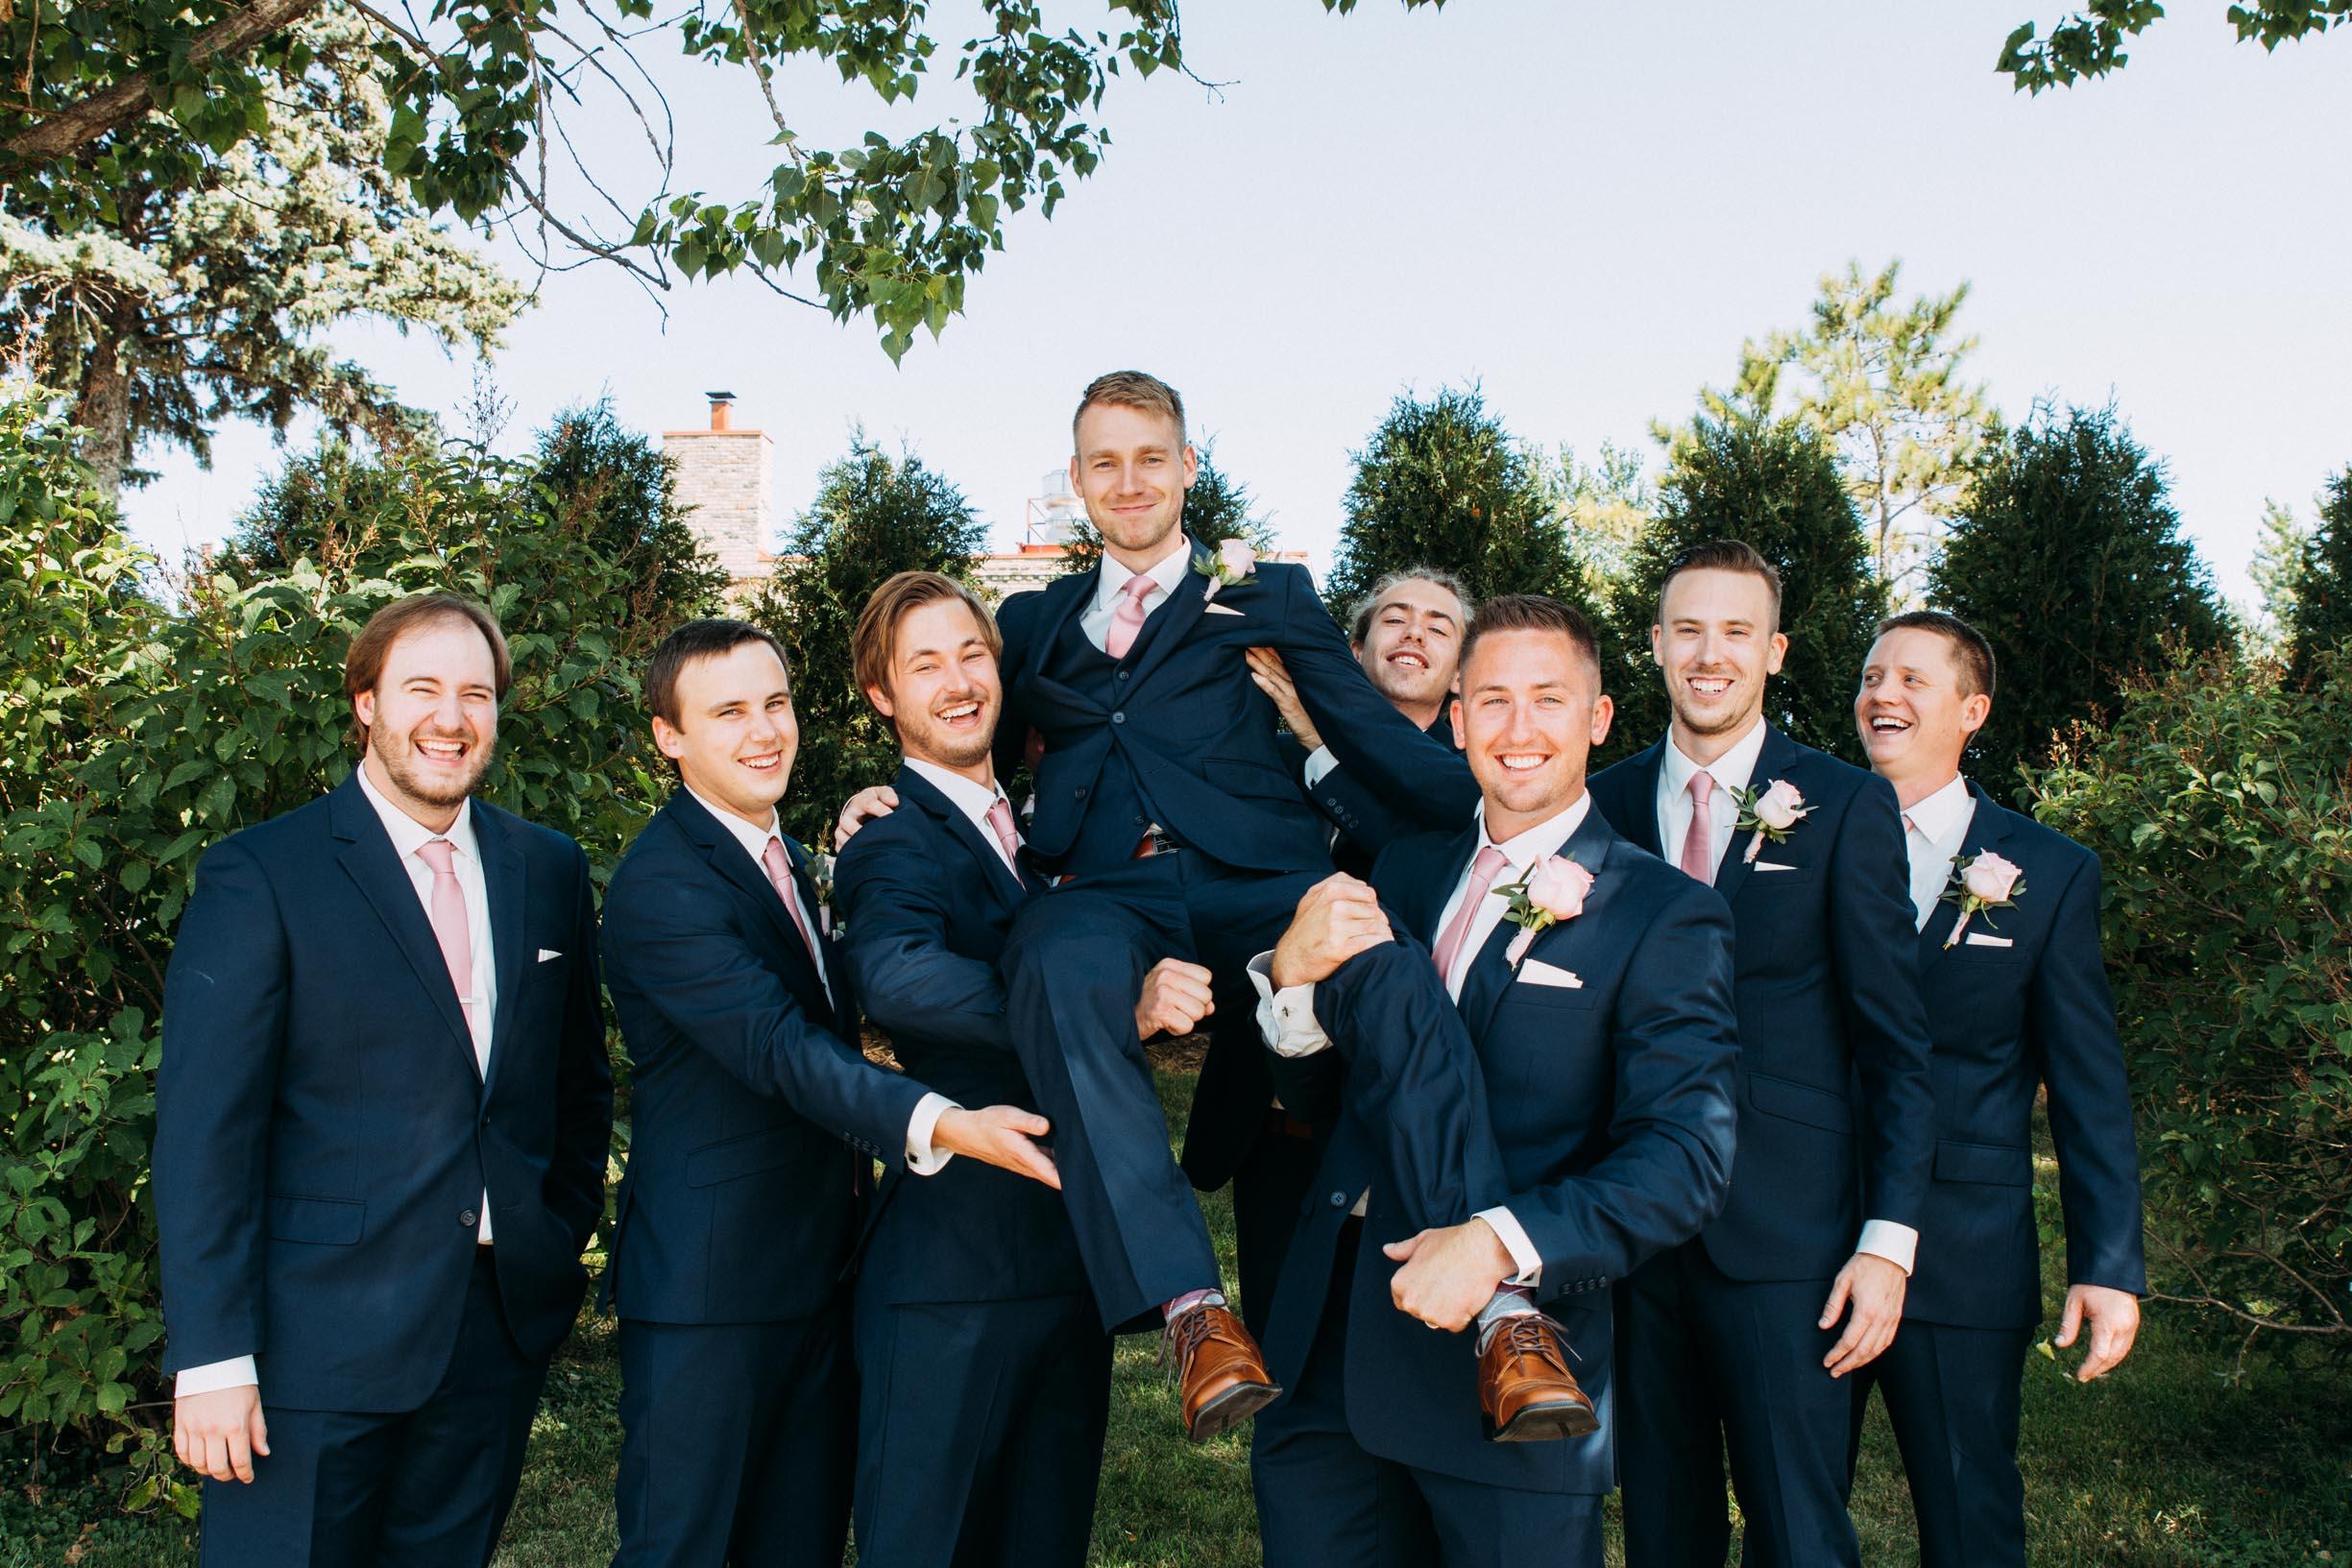 30-WeddingsattheBroz_Minnesota_WeddingBlog_WeddingParty.jpg